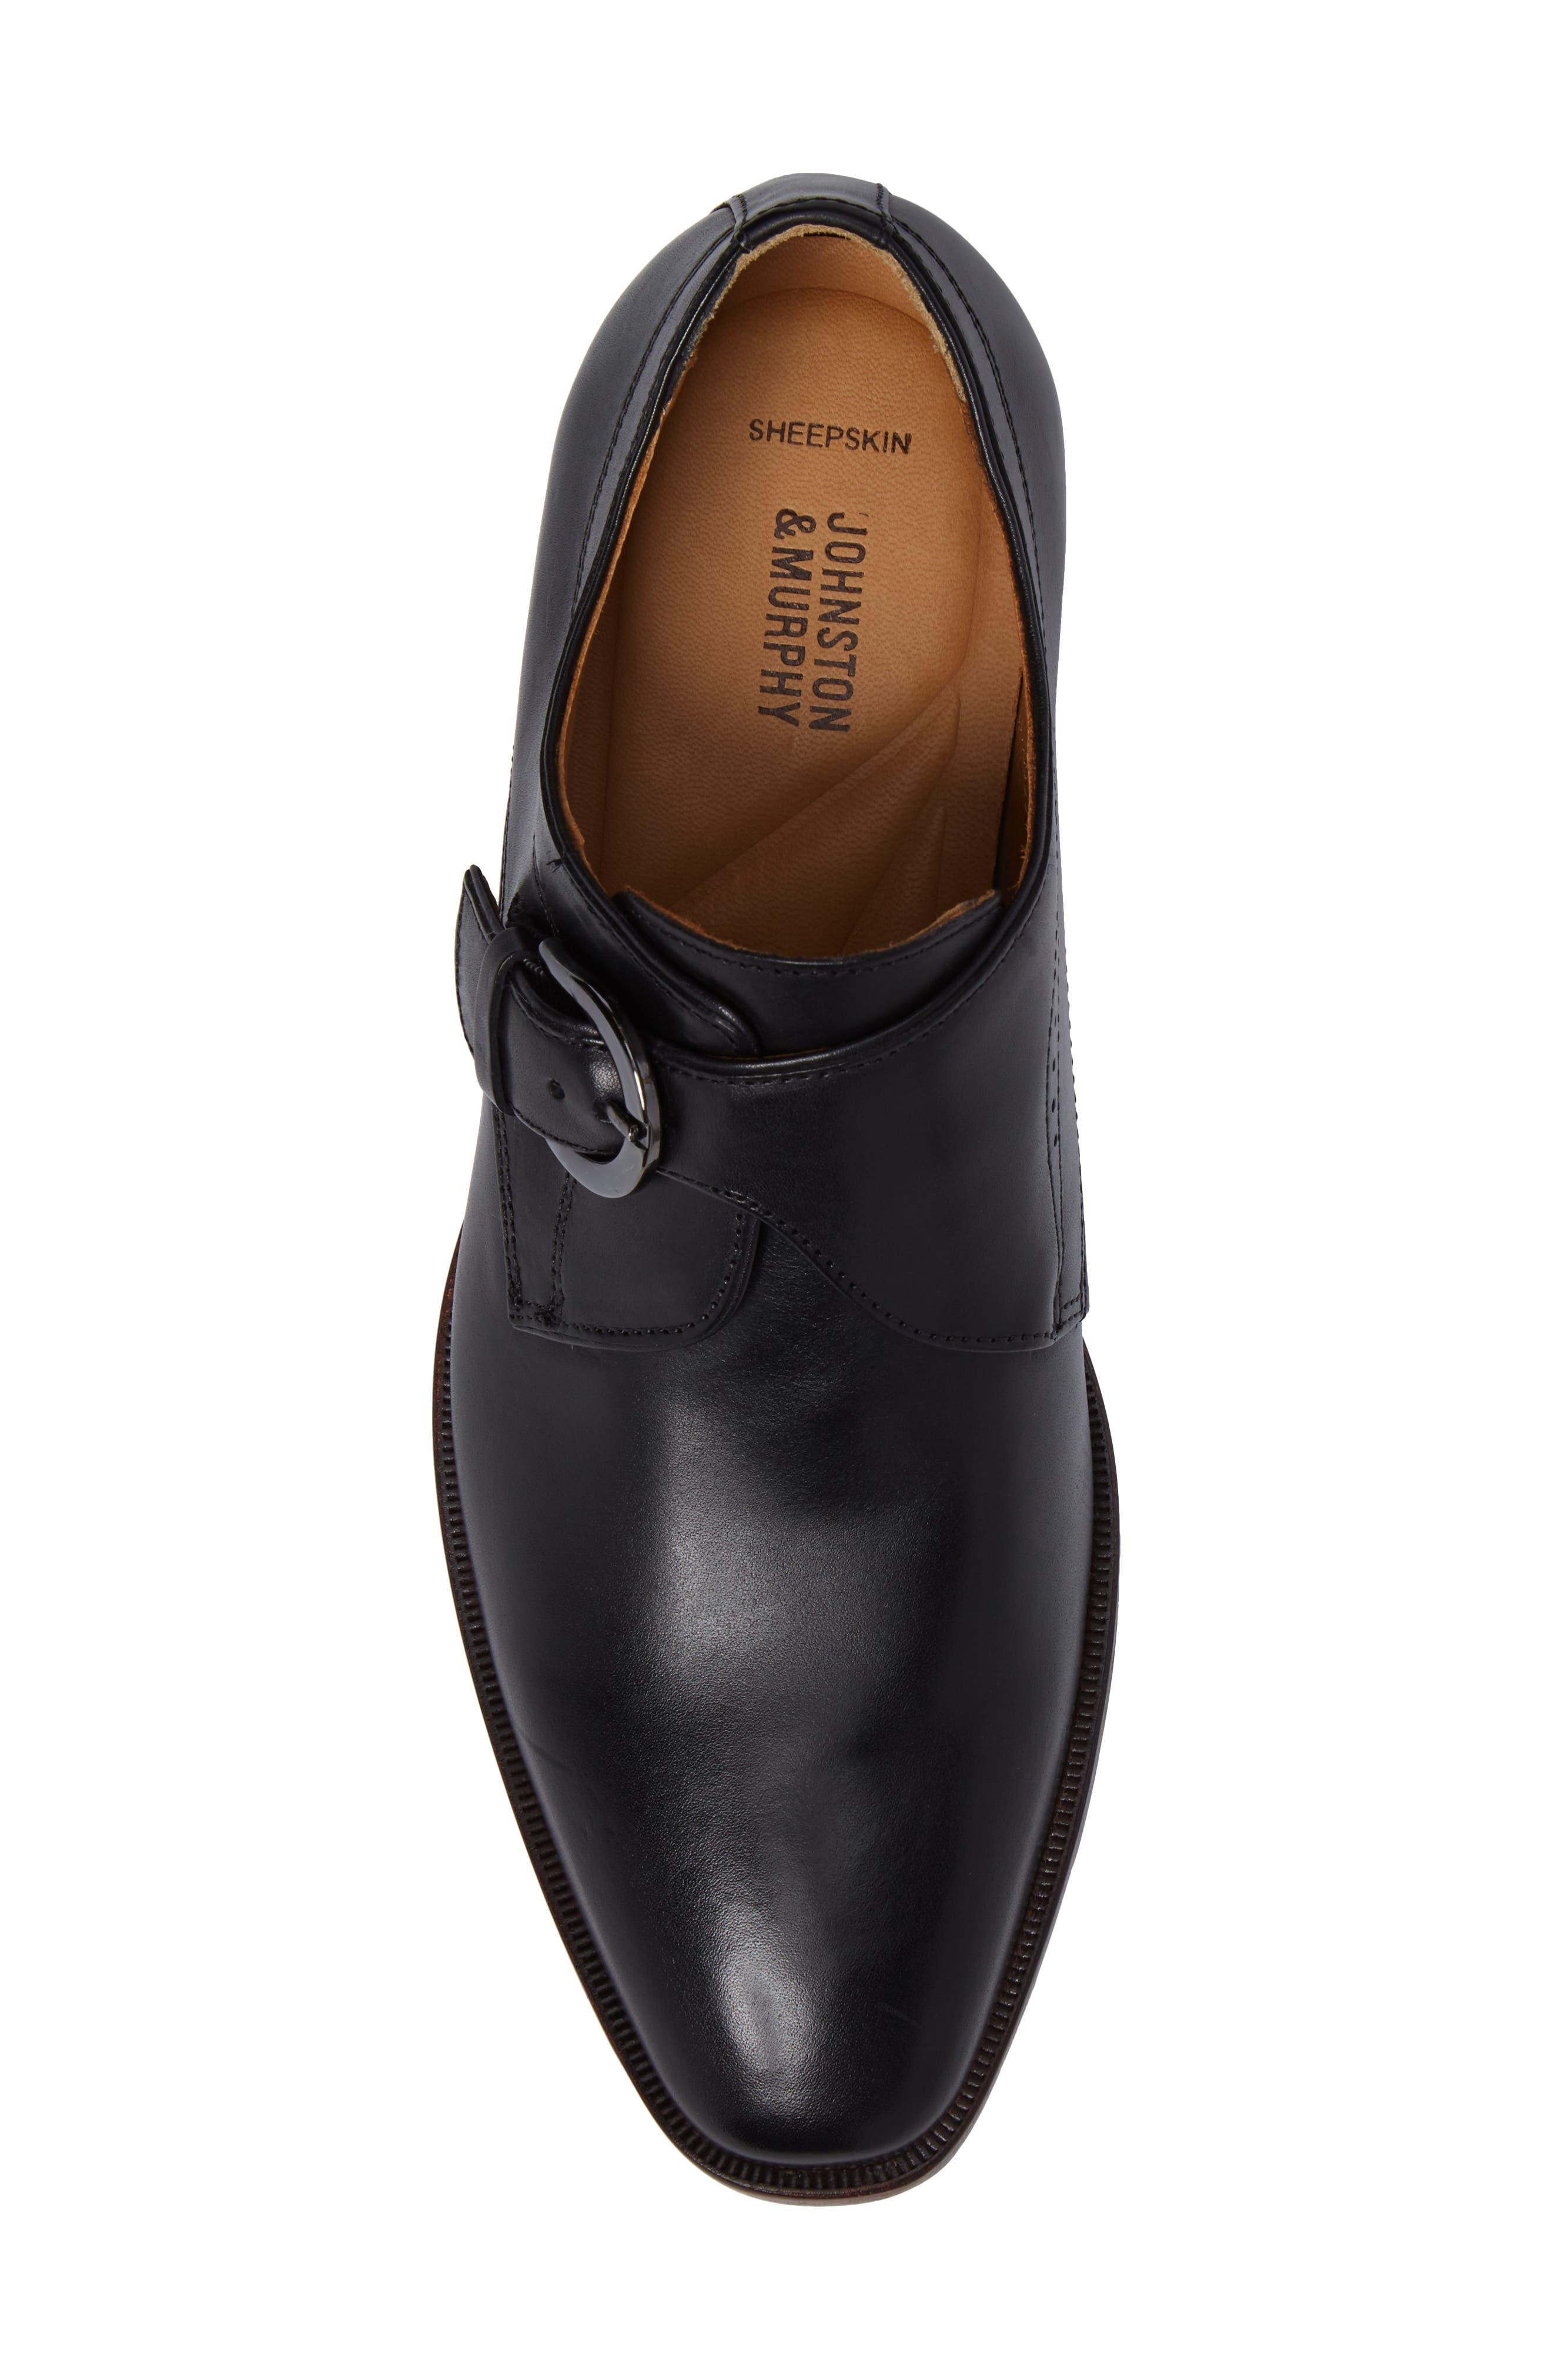 JOHNSTON & MURPHY, McClain Monk Strap Shoe, Alternate thumbnail 5, color, BLACK